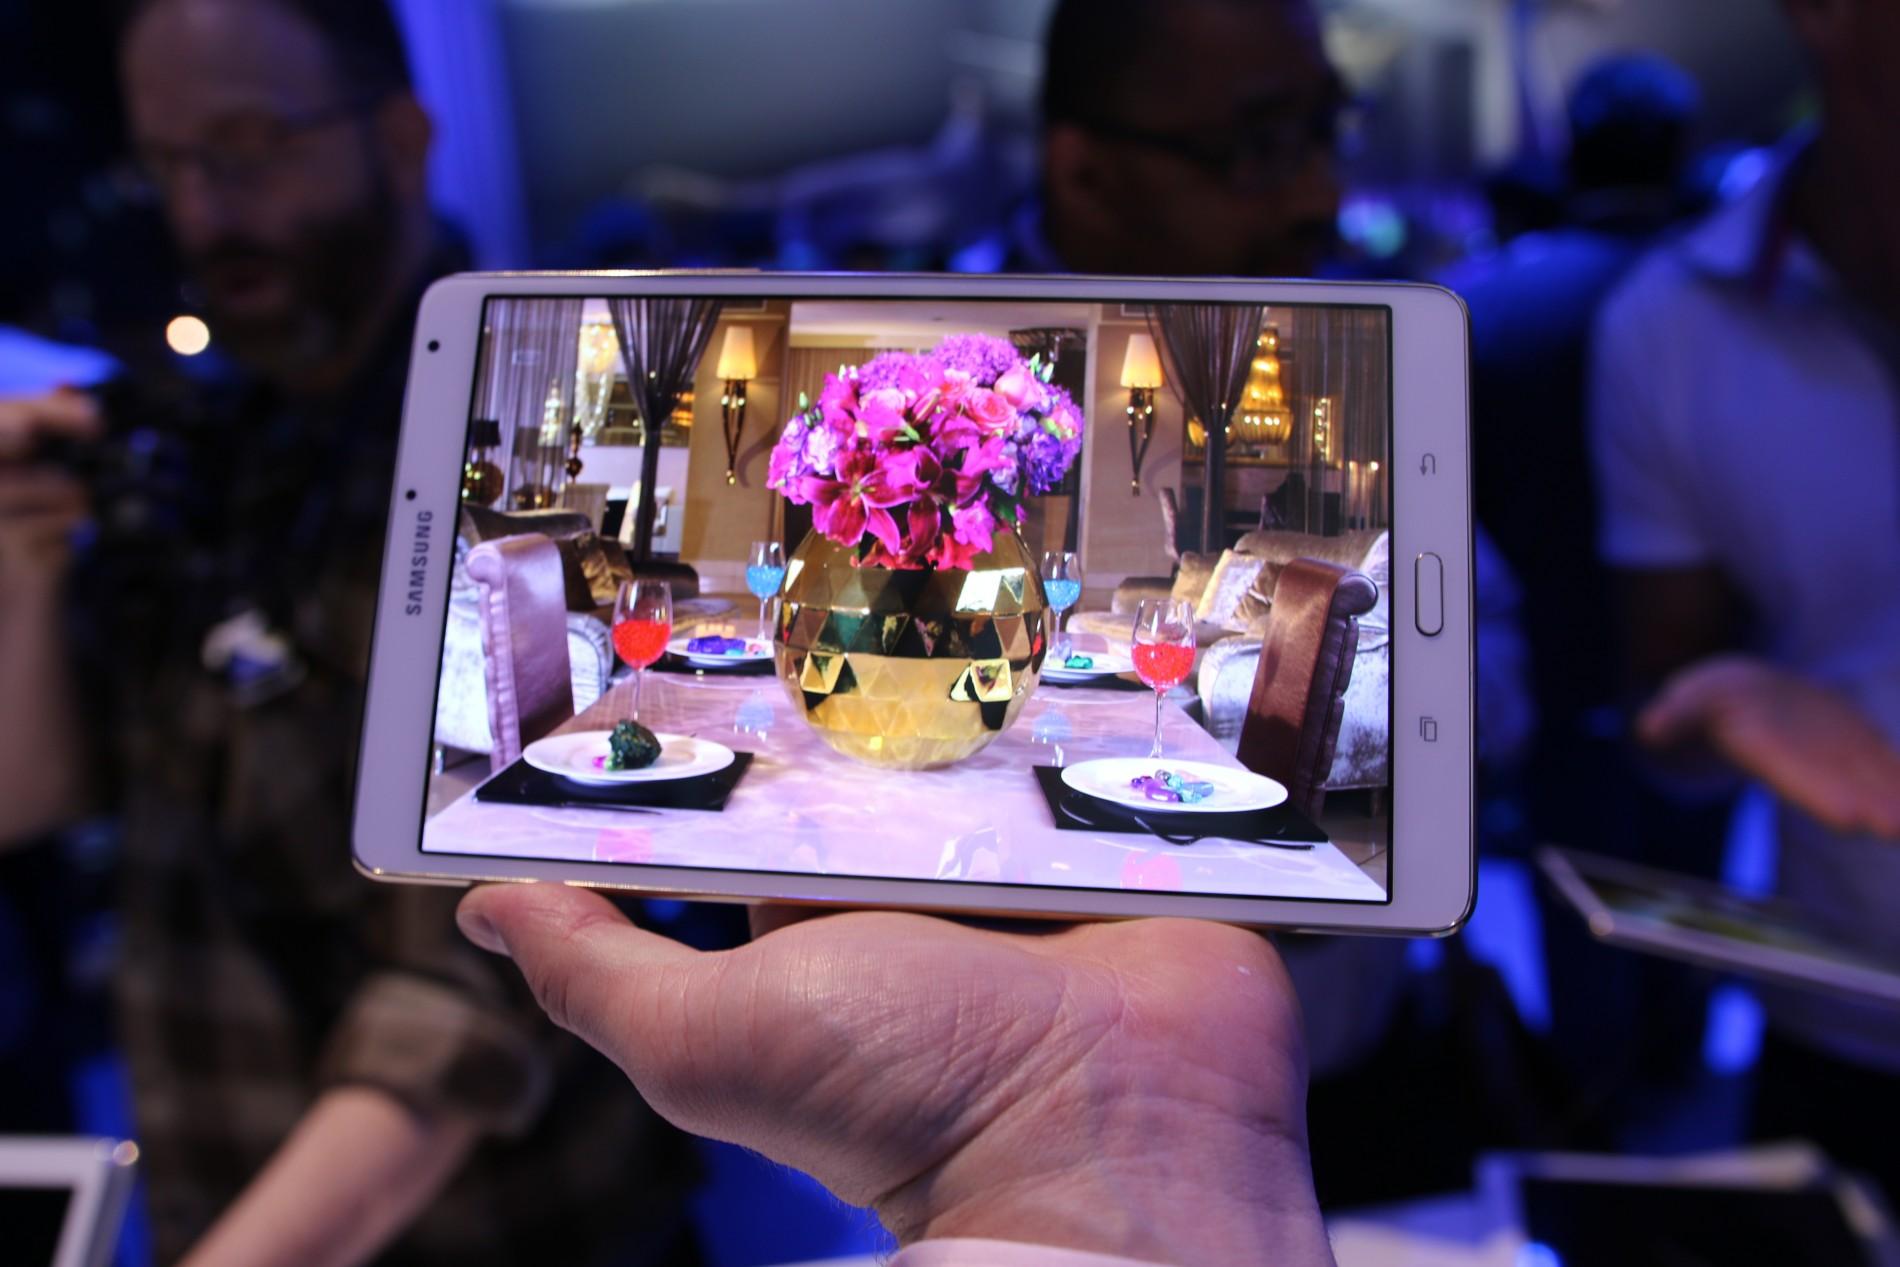 Ny Samsung Galaxy Tab S serie nu i butikkerne